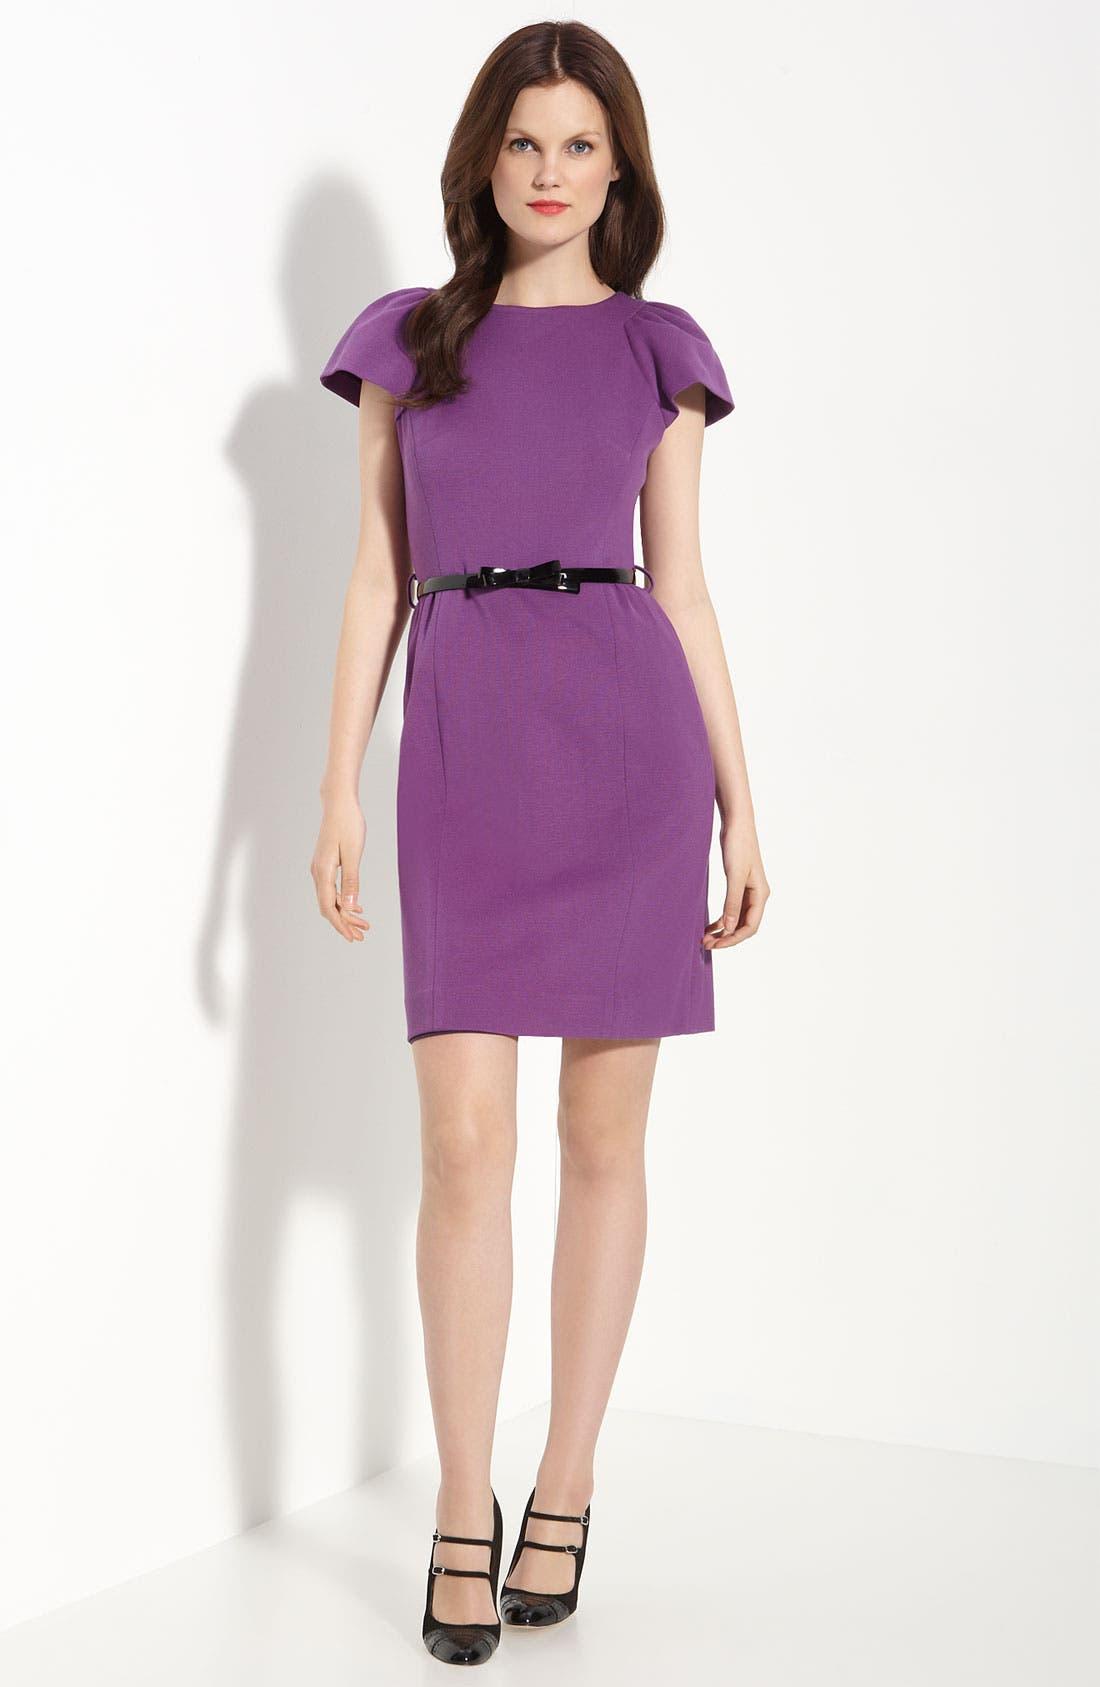 Main Image - Milly 'Addison' Ponte Knit Dress